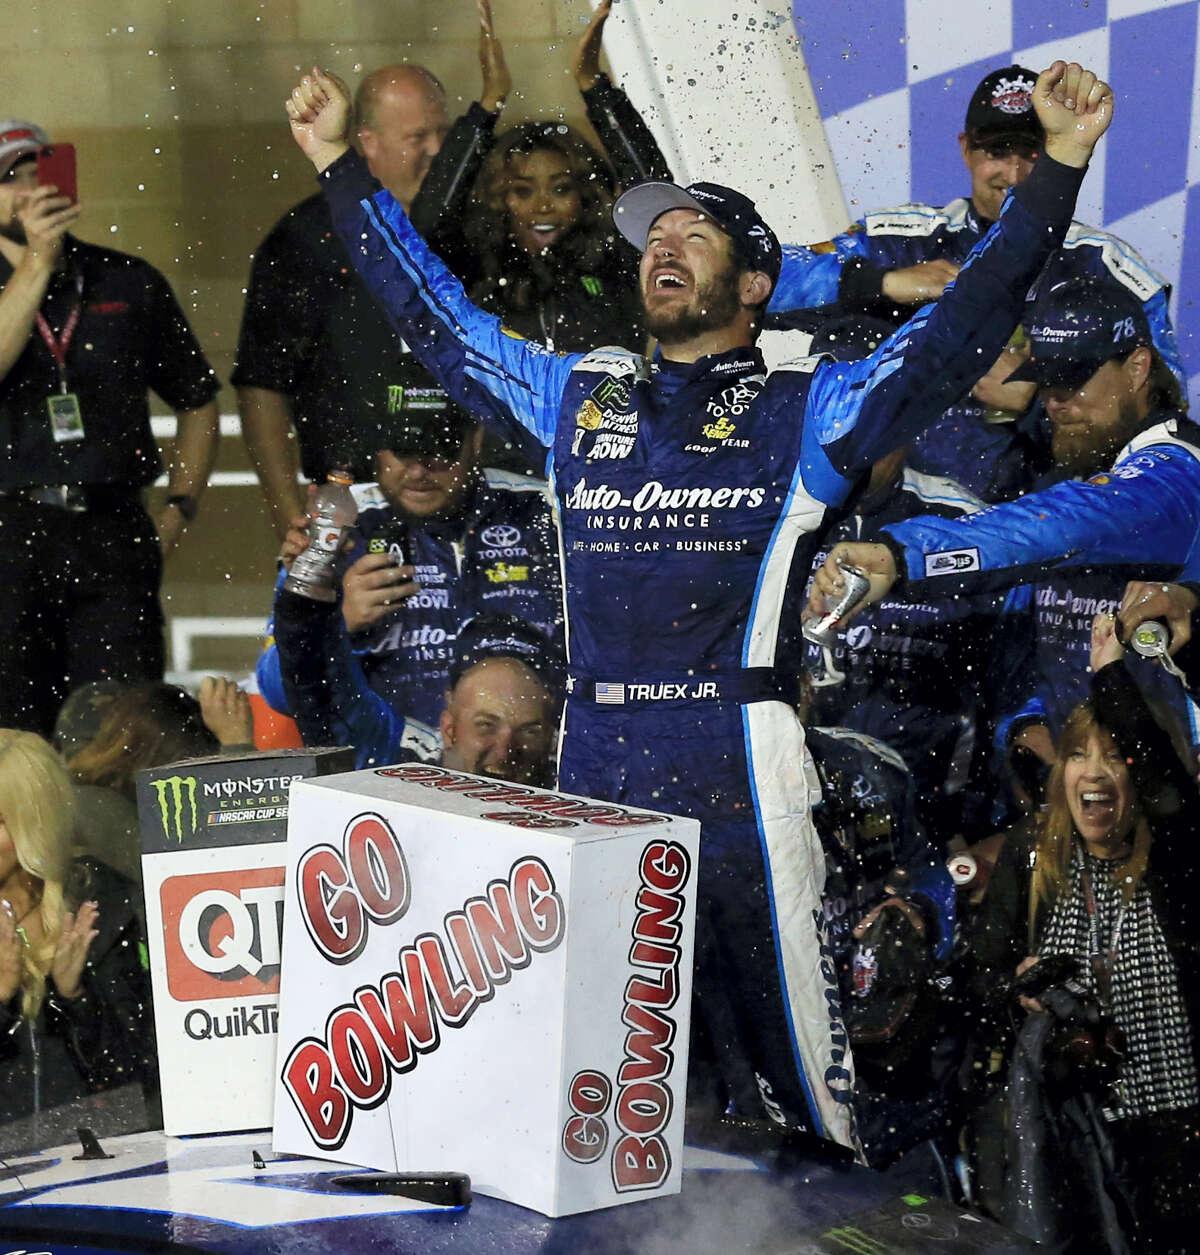 Martin Truex Jr. celebrates after winning at Kansas Speedway on Saturday night.